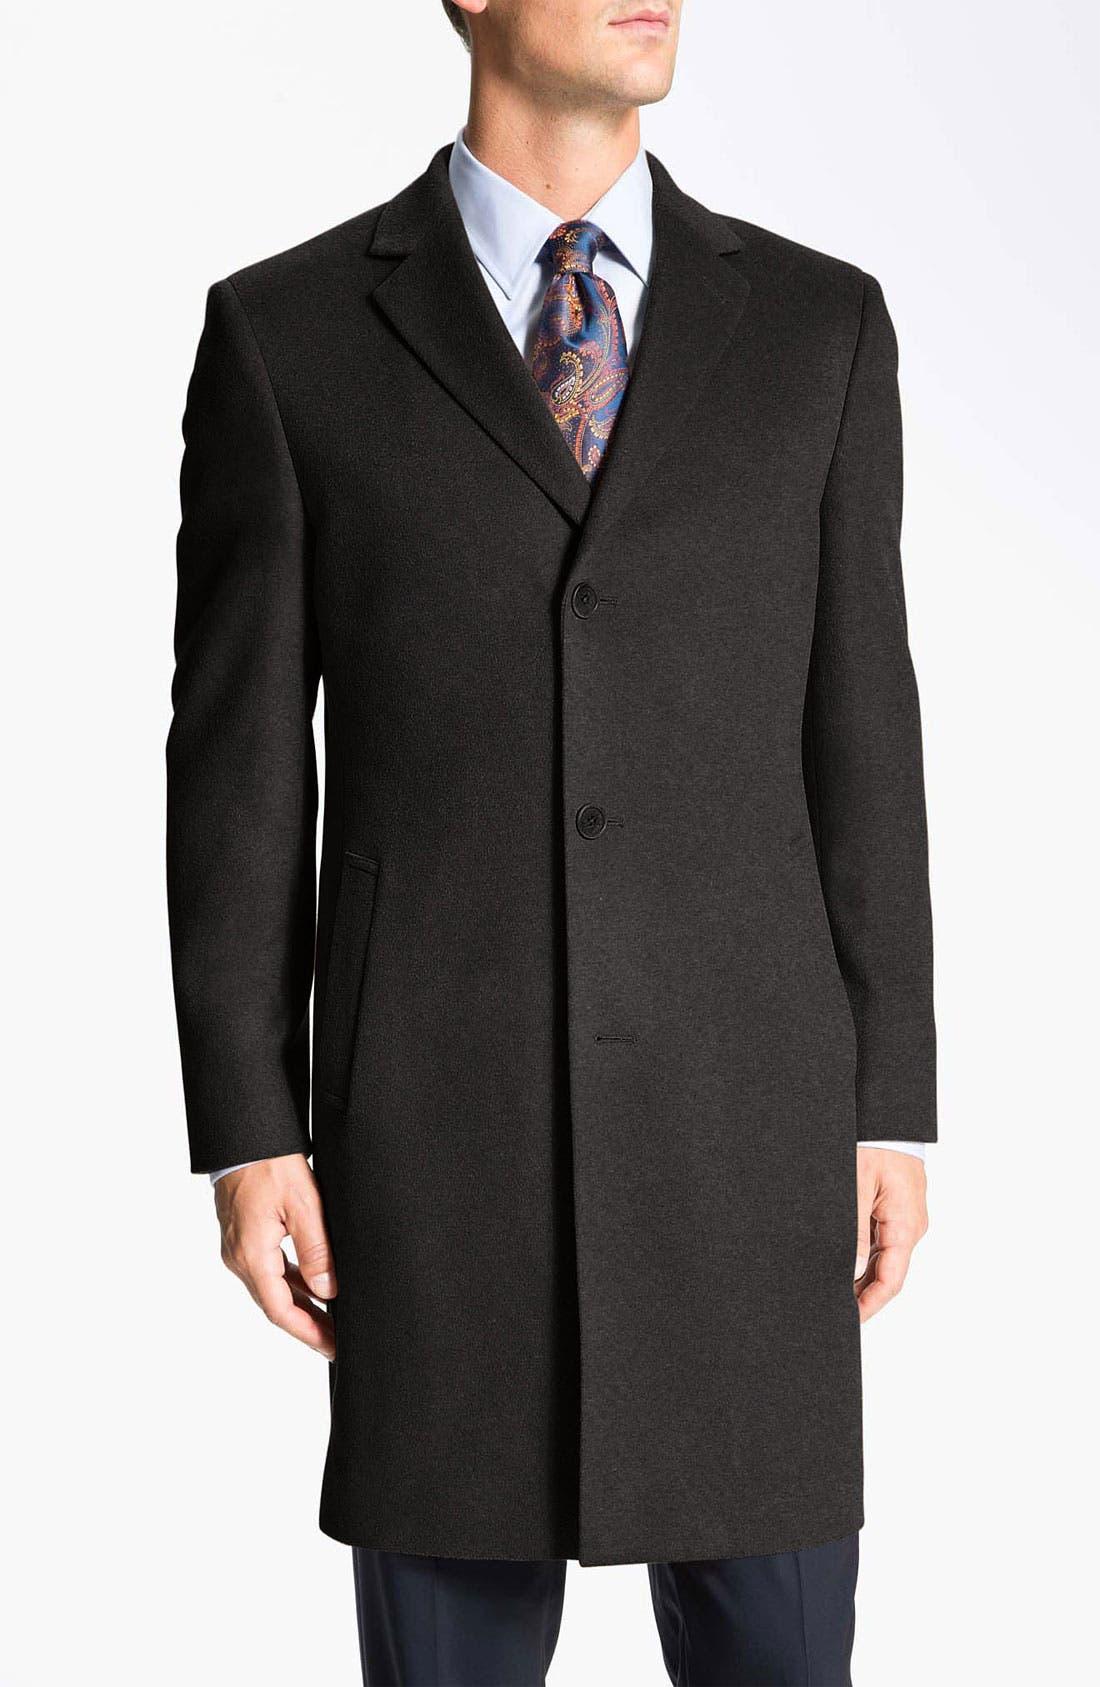 Main Image - John W. Nordstrom® Signature 'Clifton' Cashmere Top Coat